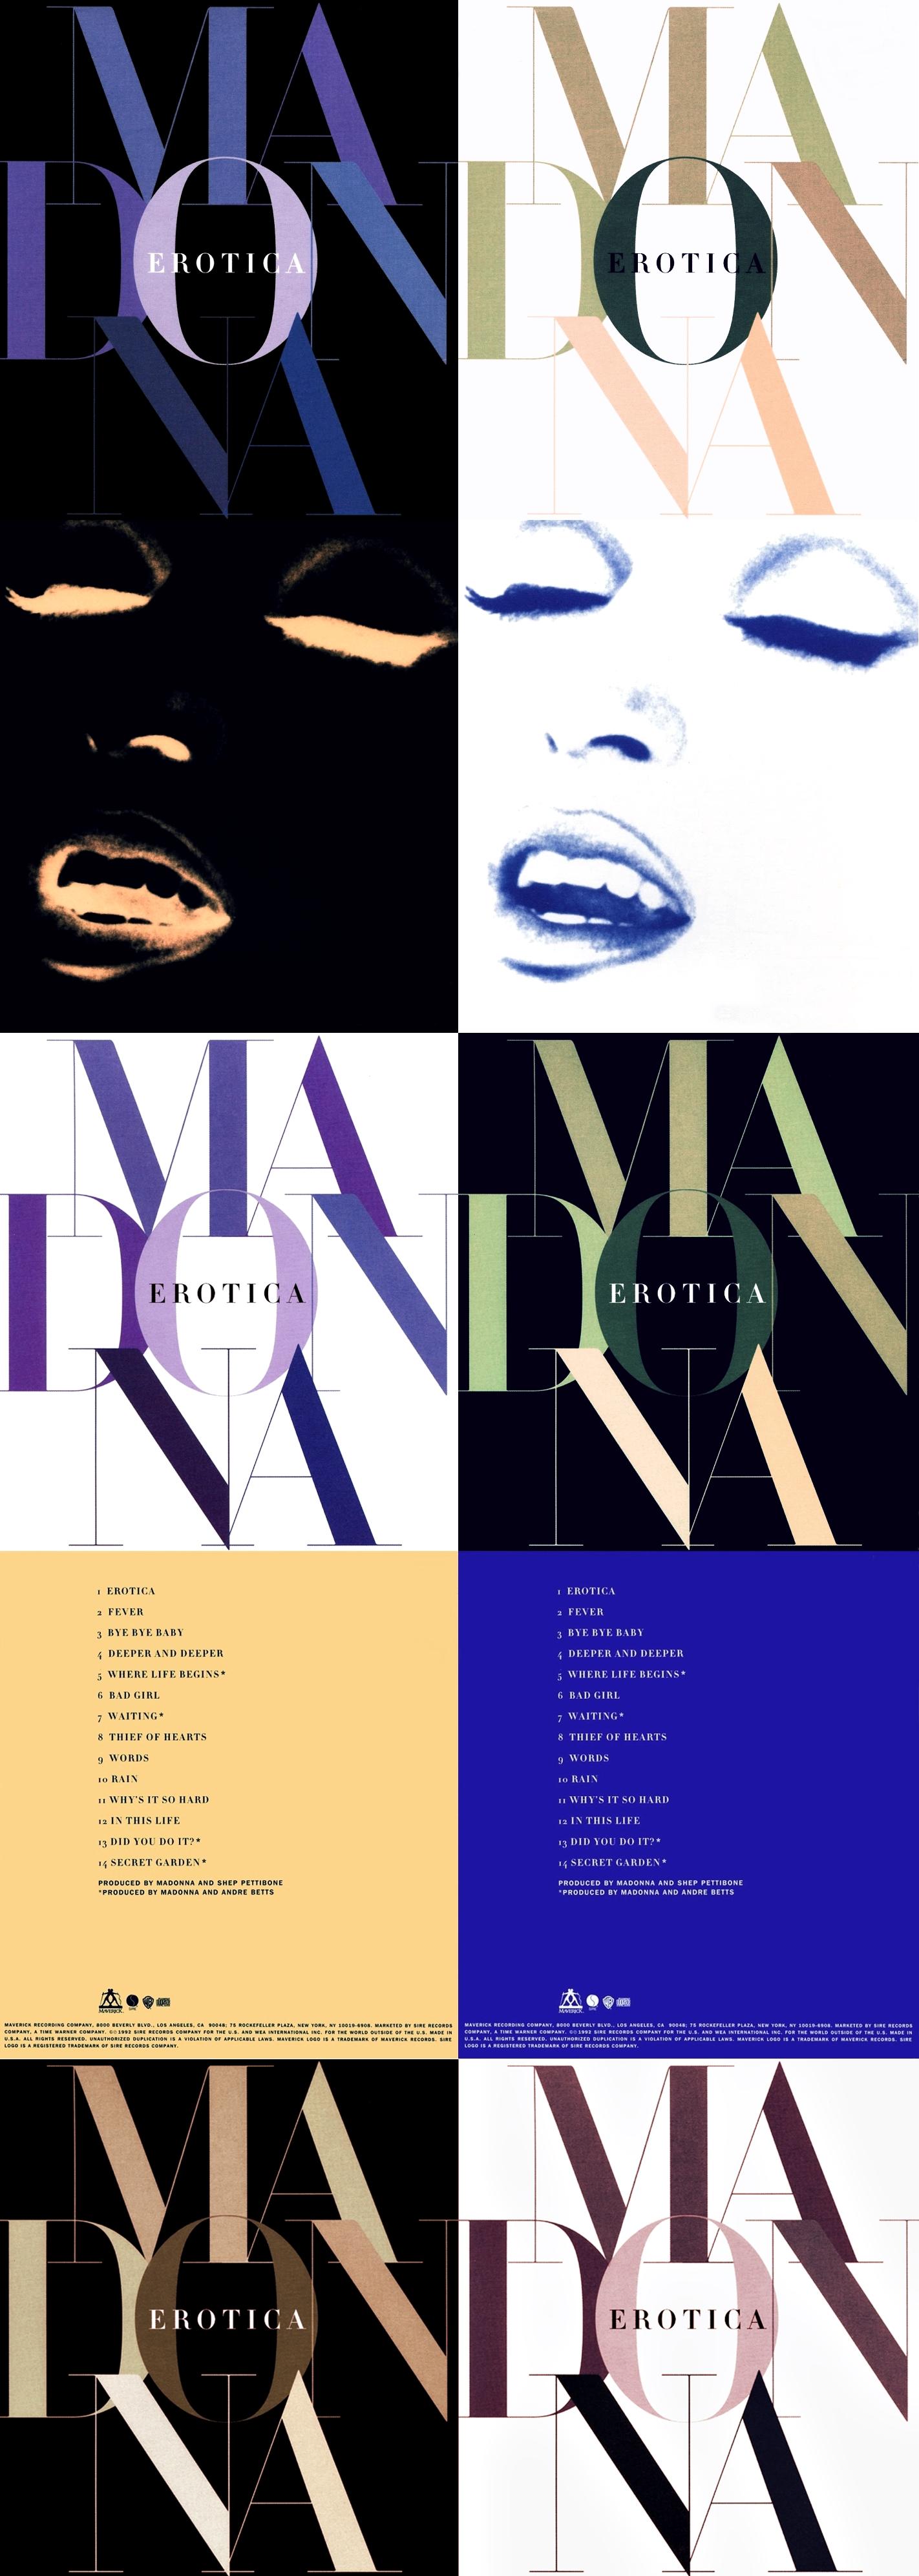 Erotica Album Today In Madonna History